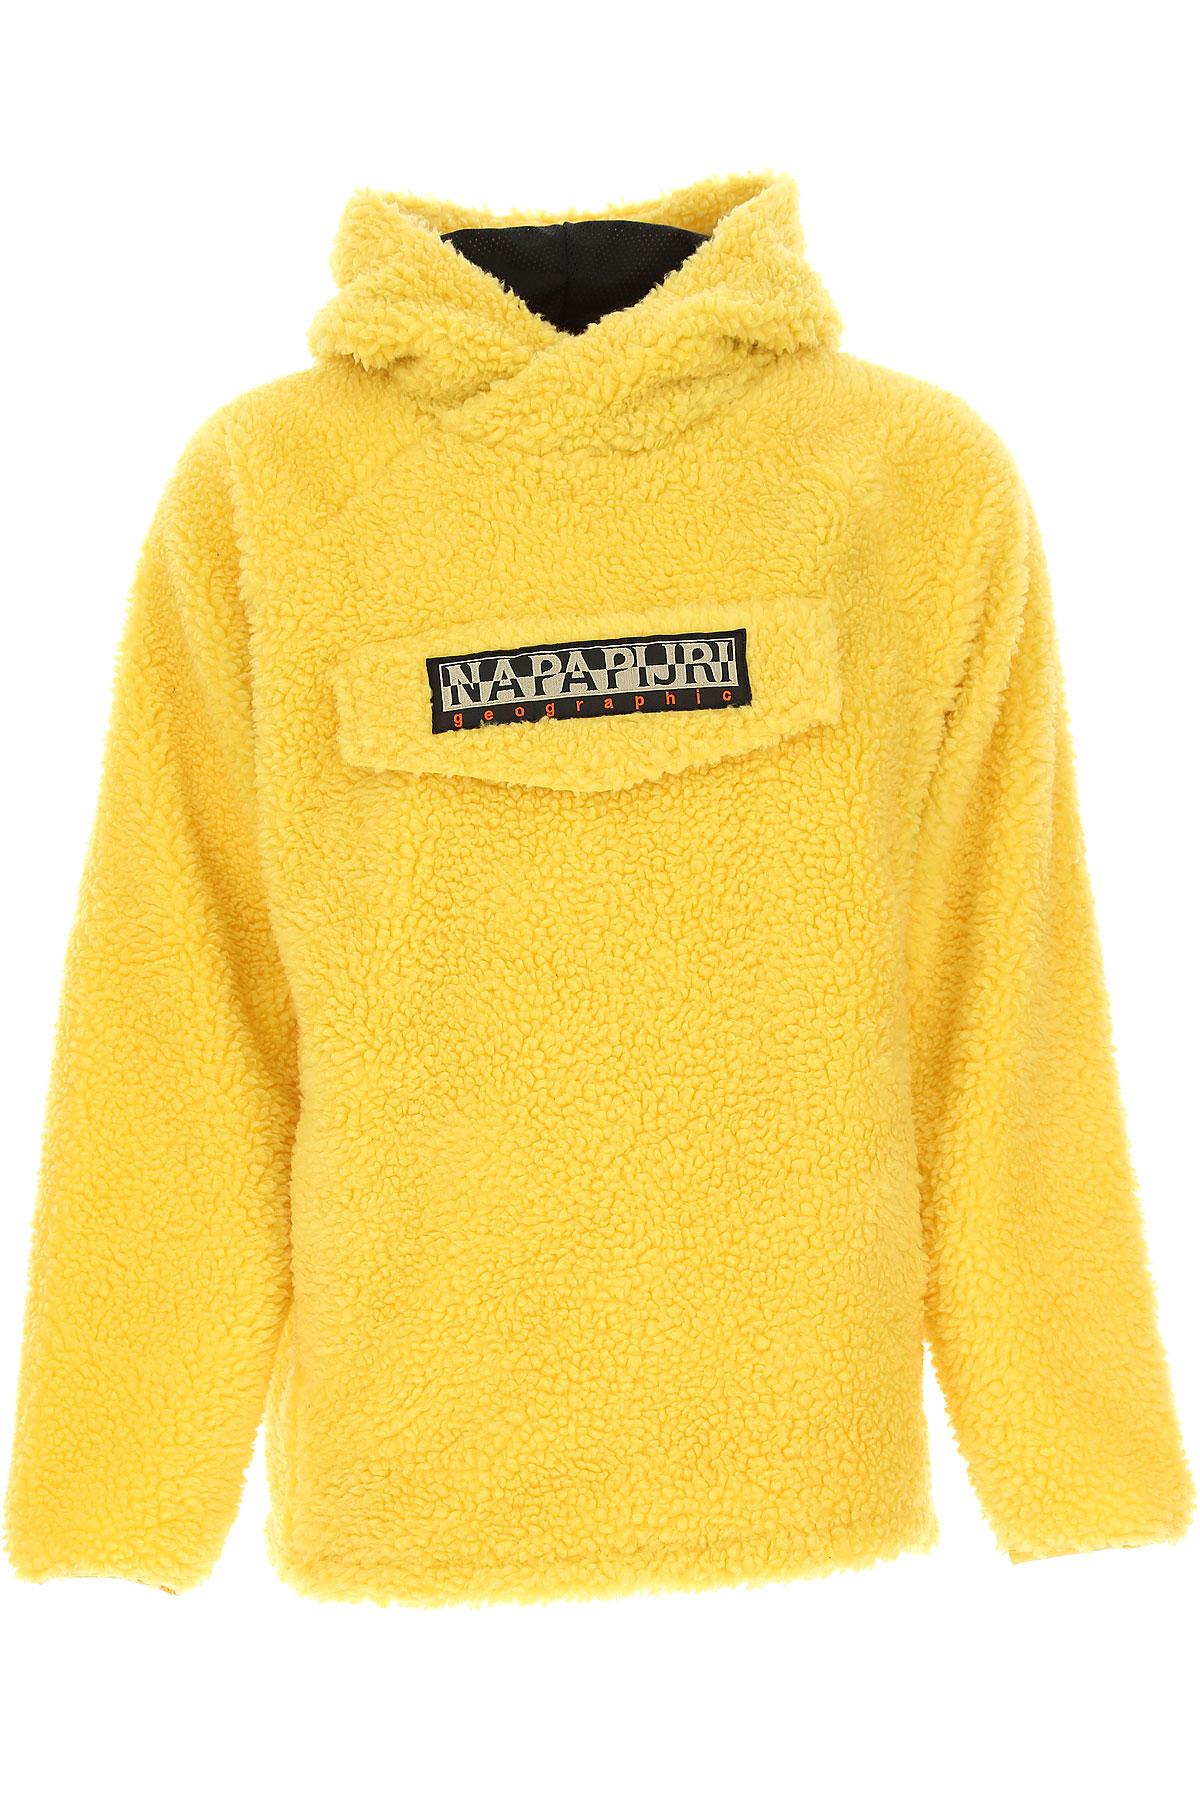 Napapijri Jacket for Men, Yellow, polyester, 2017, L M S XL